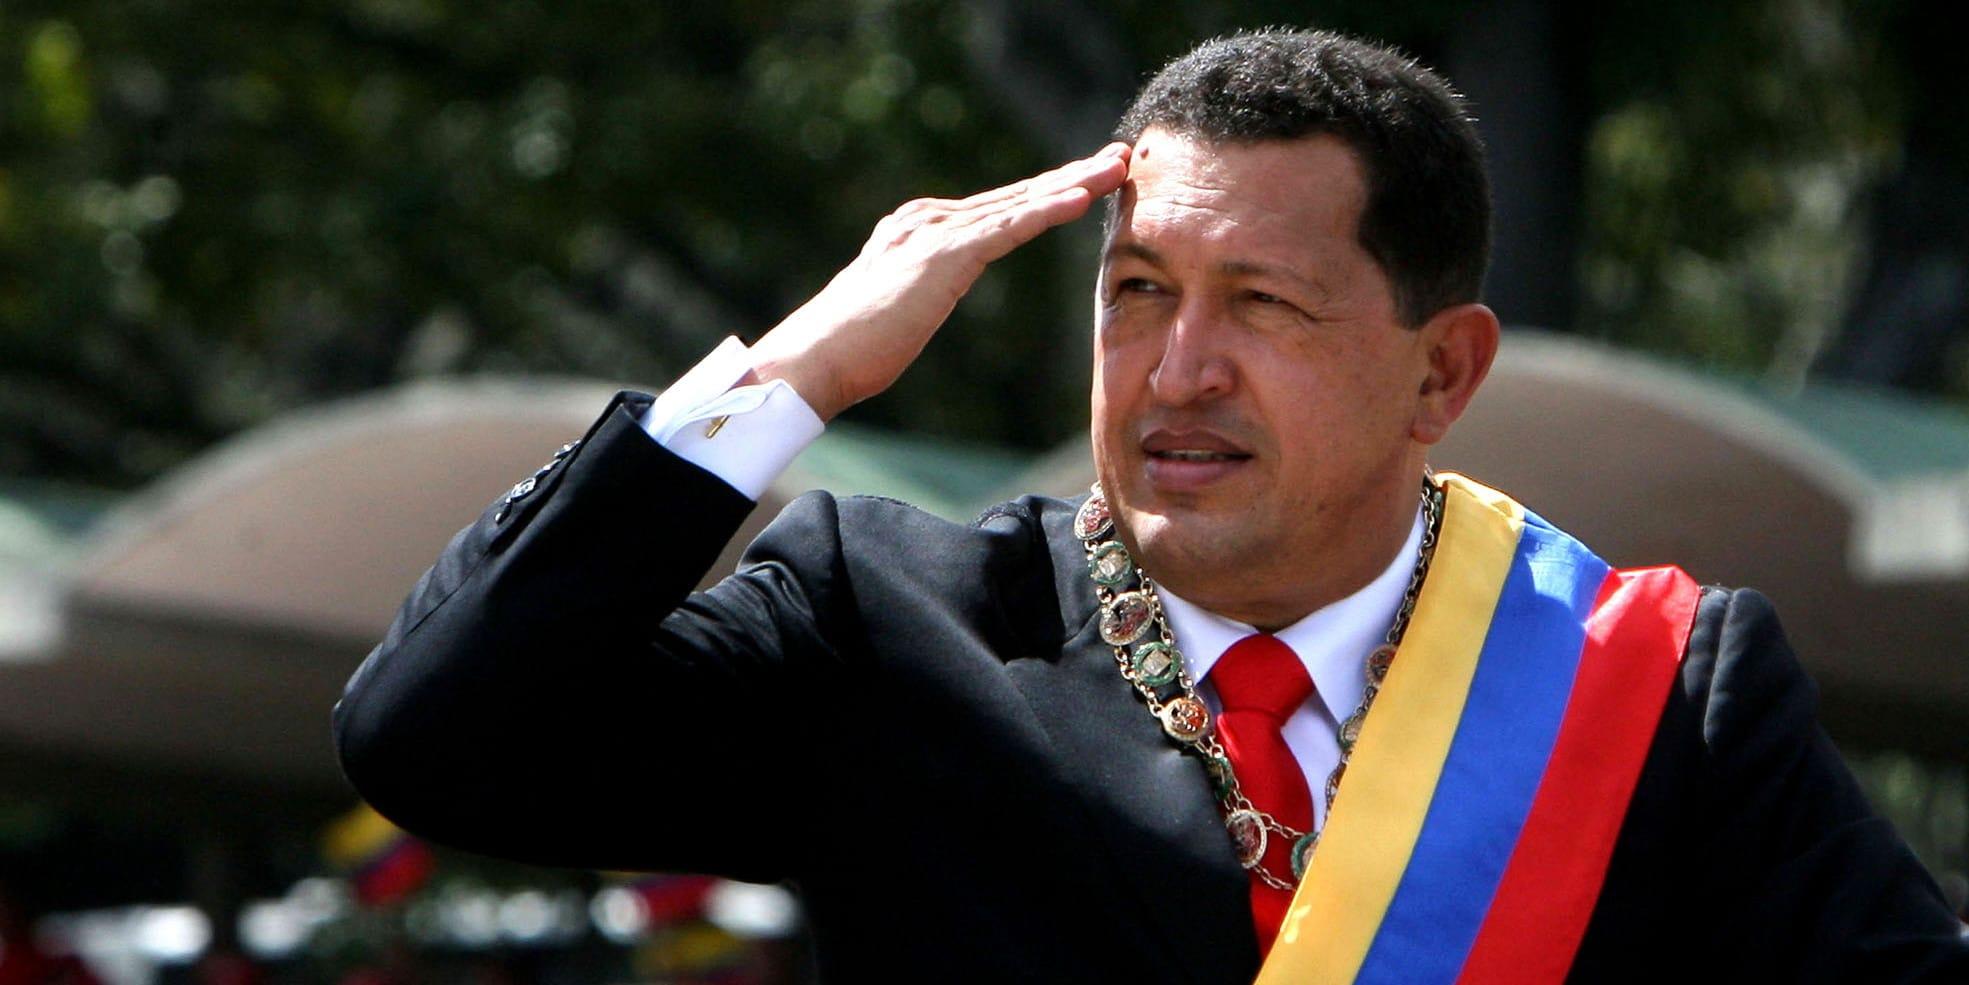 https://external-content.duckduckgo.com/iu/?u=https%3A%2F%2Fnetworthpost.org%2Fwp-content%2Fuploads%2F2015%2F04%2FHugo-Chavez-Net-Worth.jpg&f=1&nofb=1